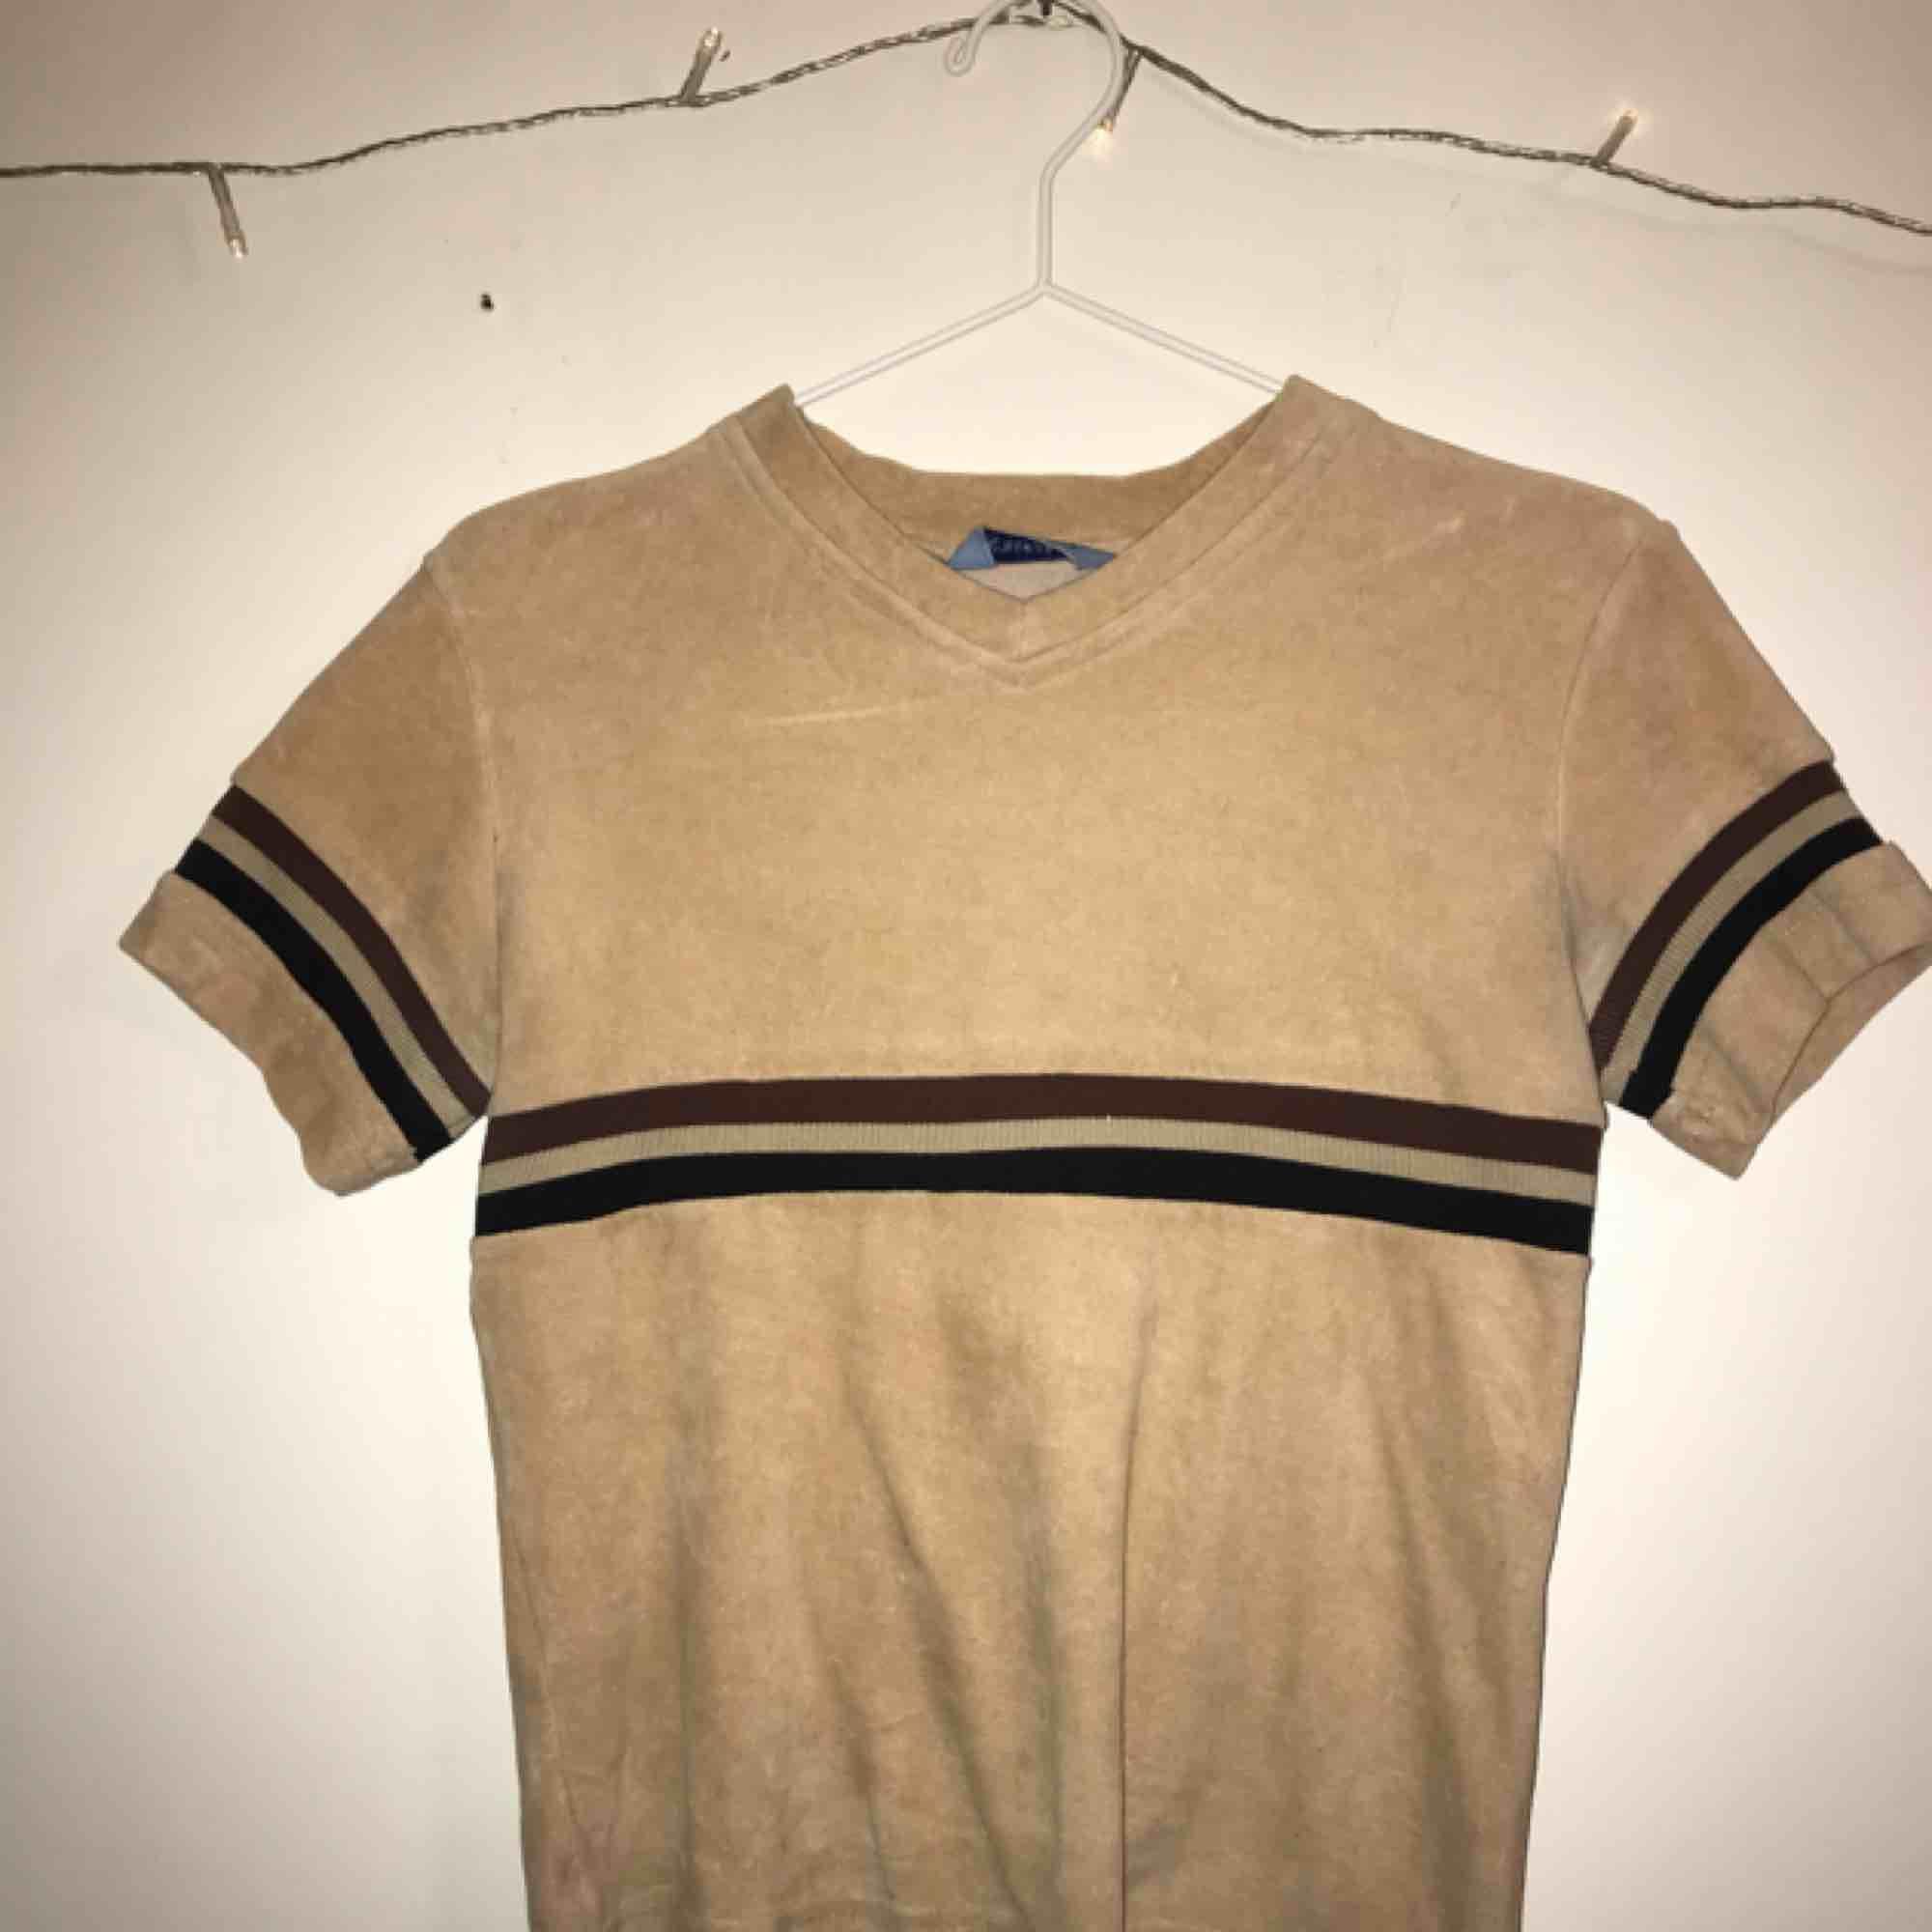 Superfin brun, beige aktig tröja i velvet material. Står inte vilken storlek men skulle gissa på att den passar s/xs. Skjortor.